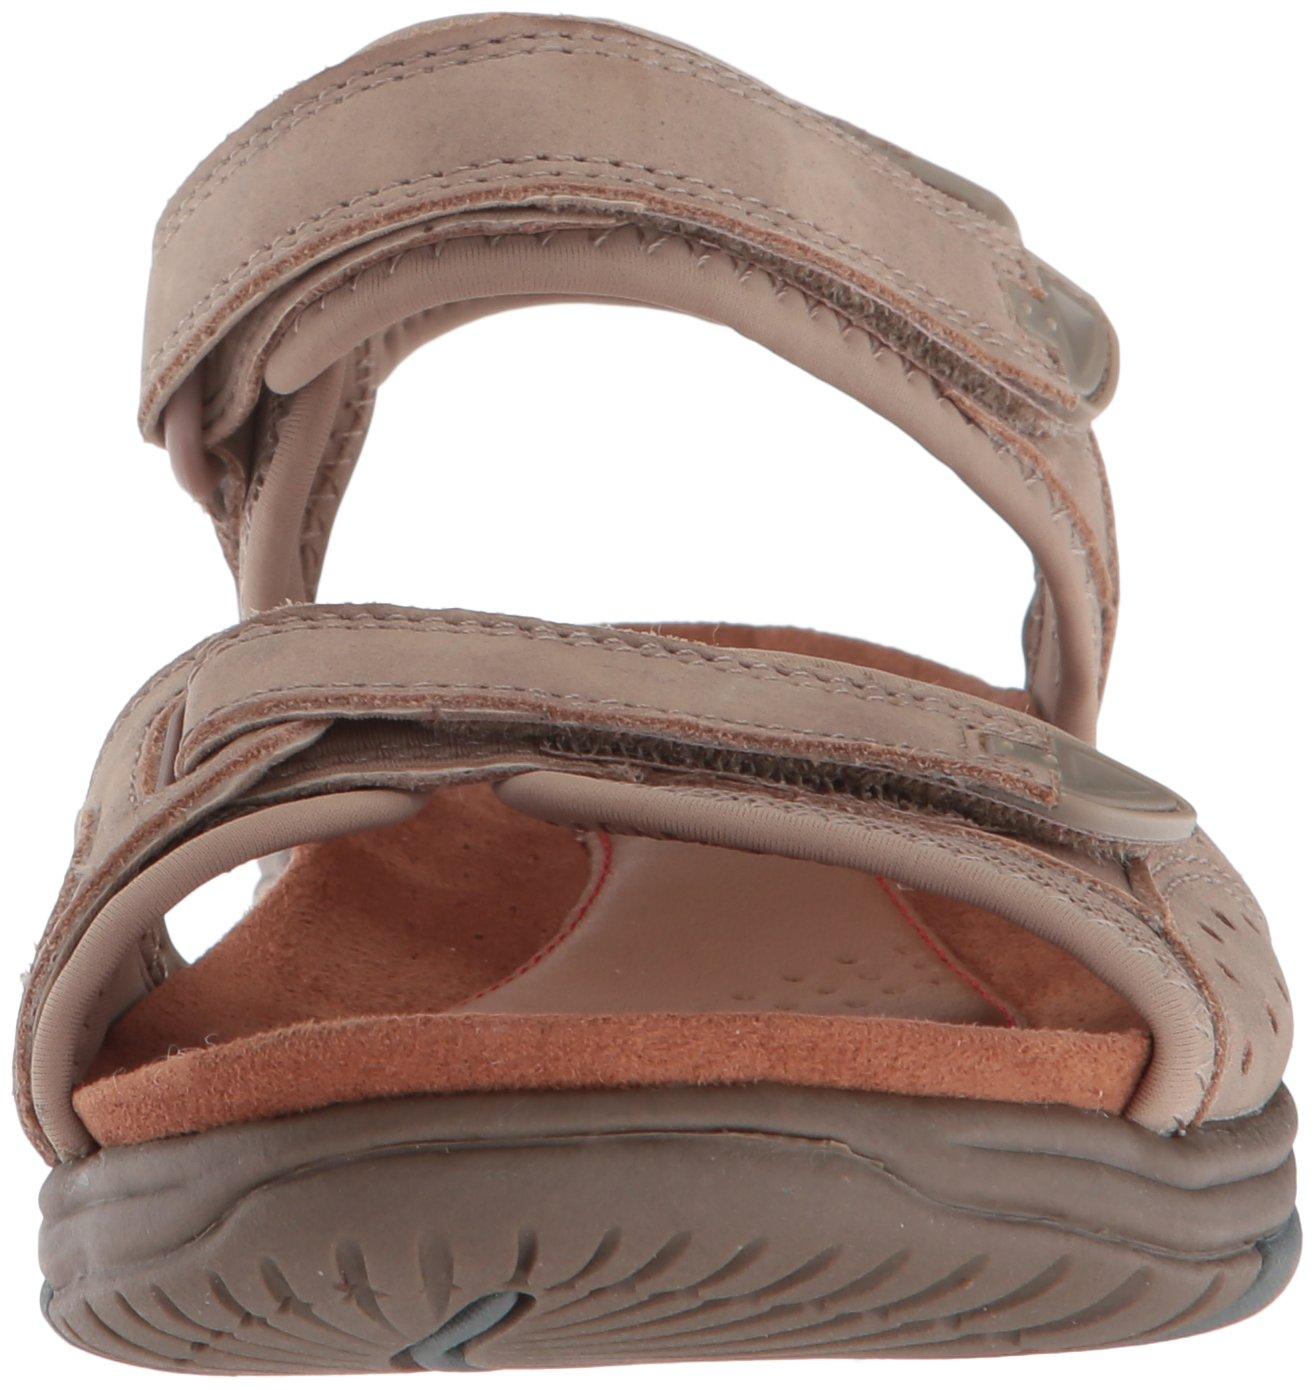 Rockport Women's Franklin Three W Strap Sport Sandal B073ZSVZK7 7.5 W Three US|Sand a2e880